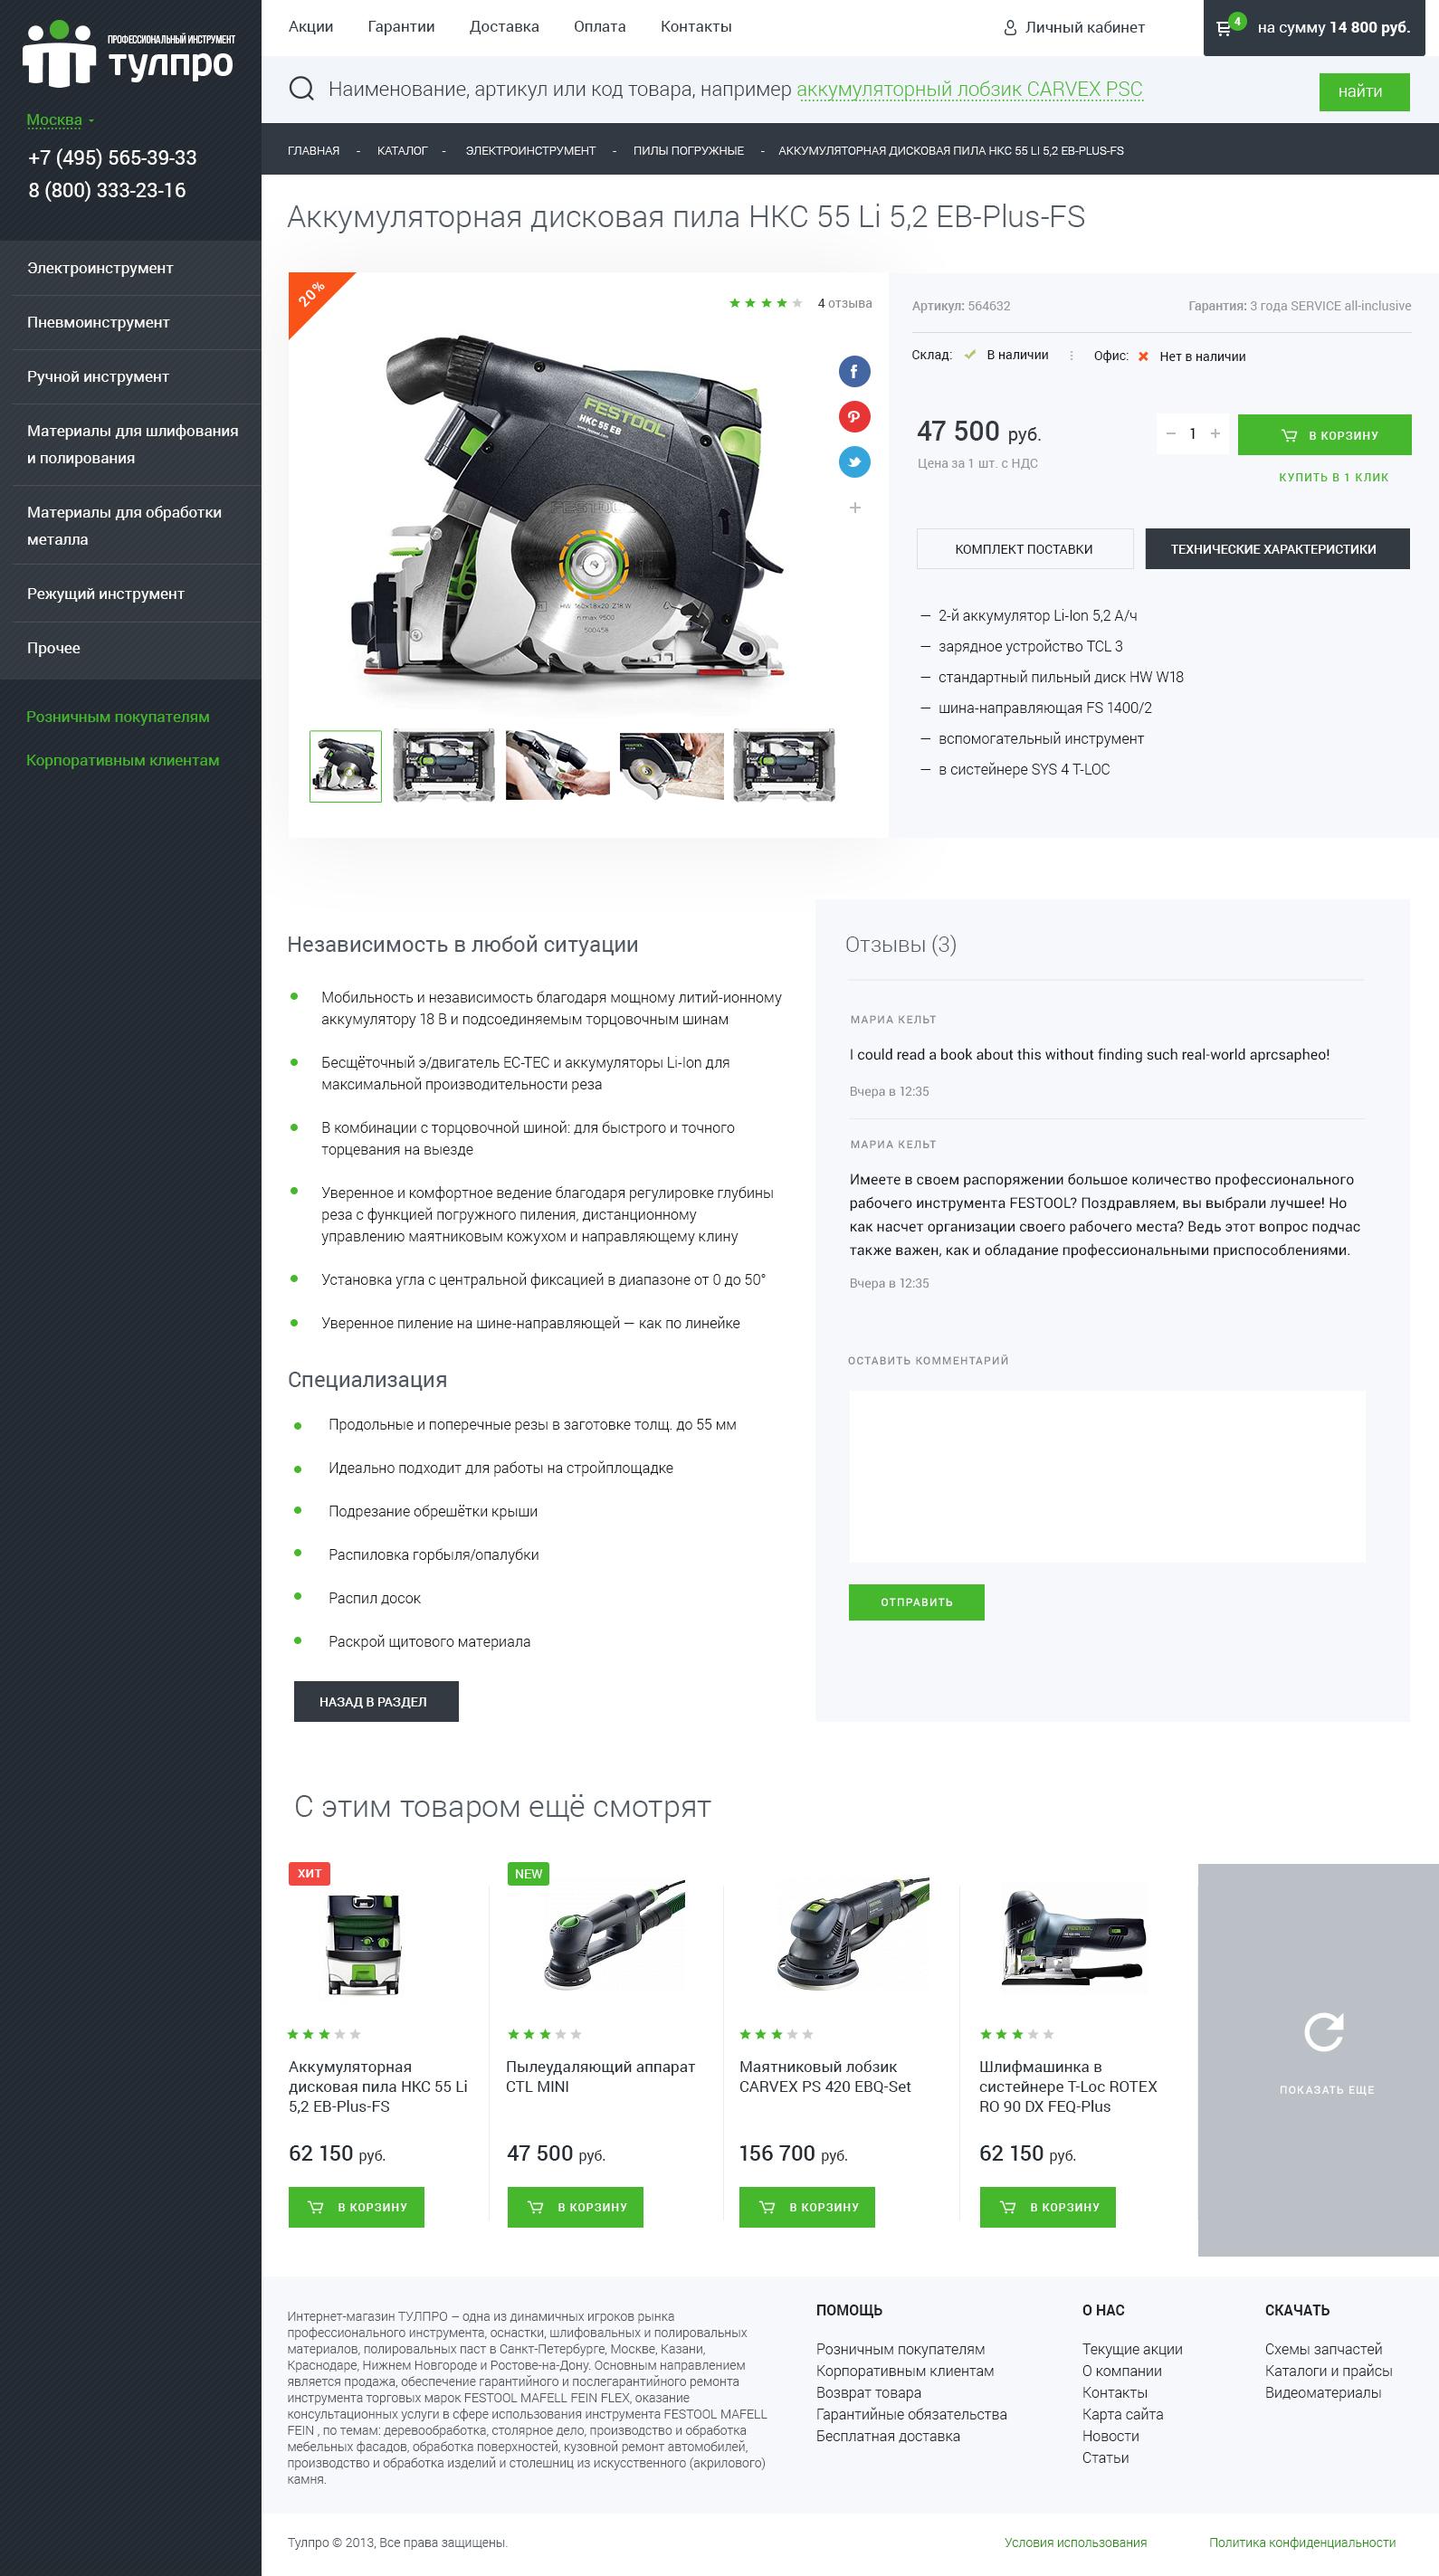 Интернет – магазин инструмента  «Тулпро»